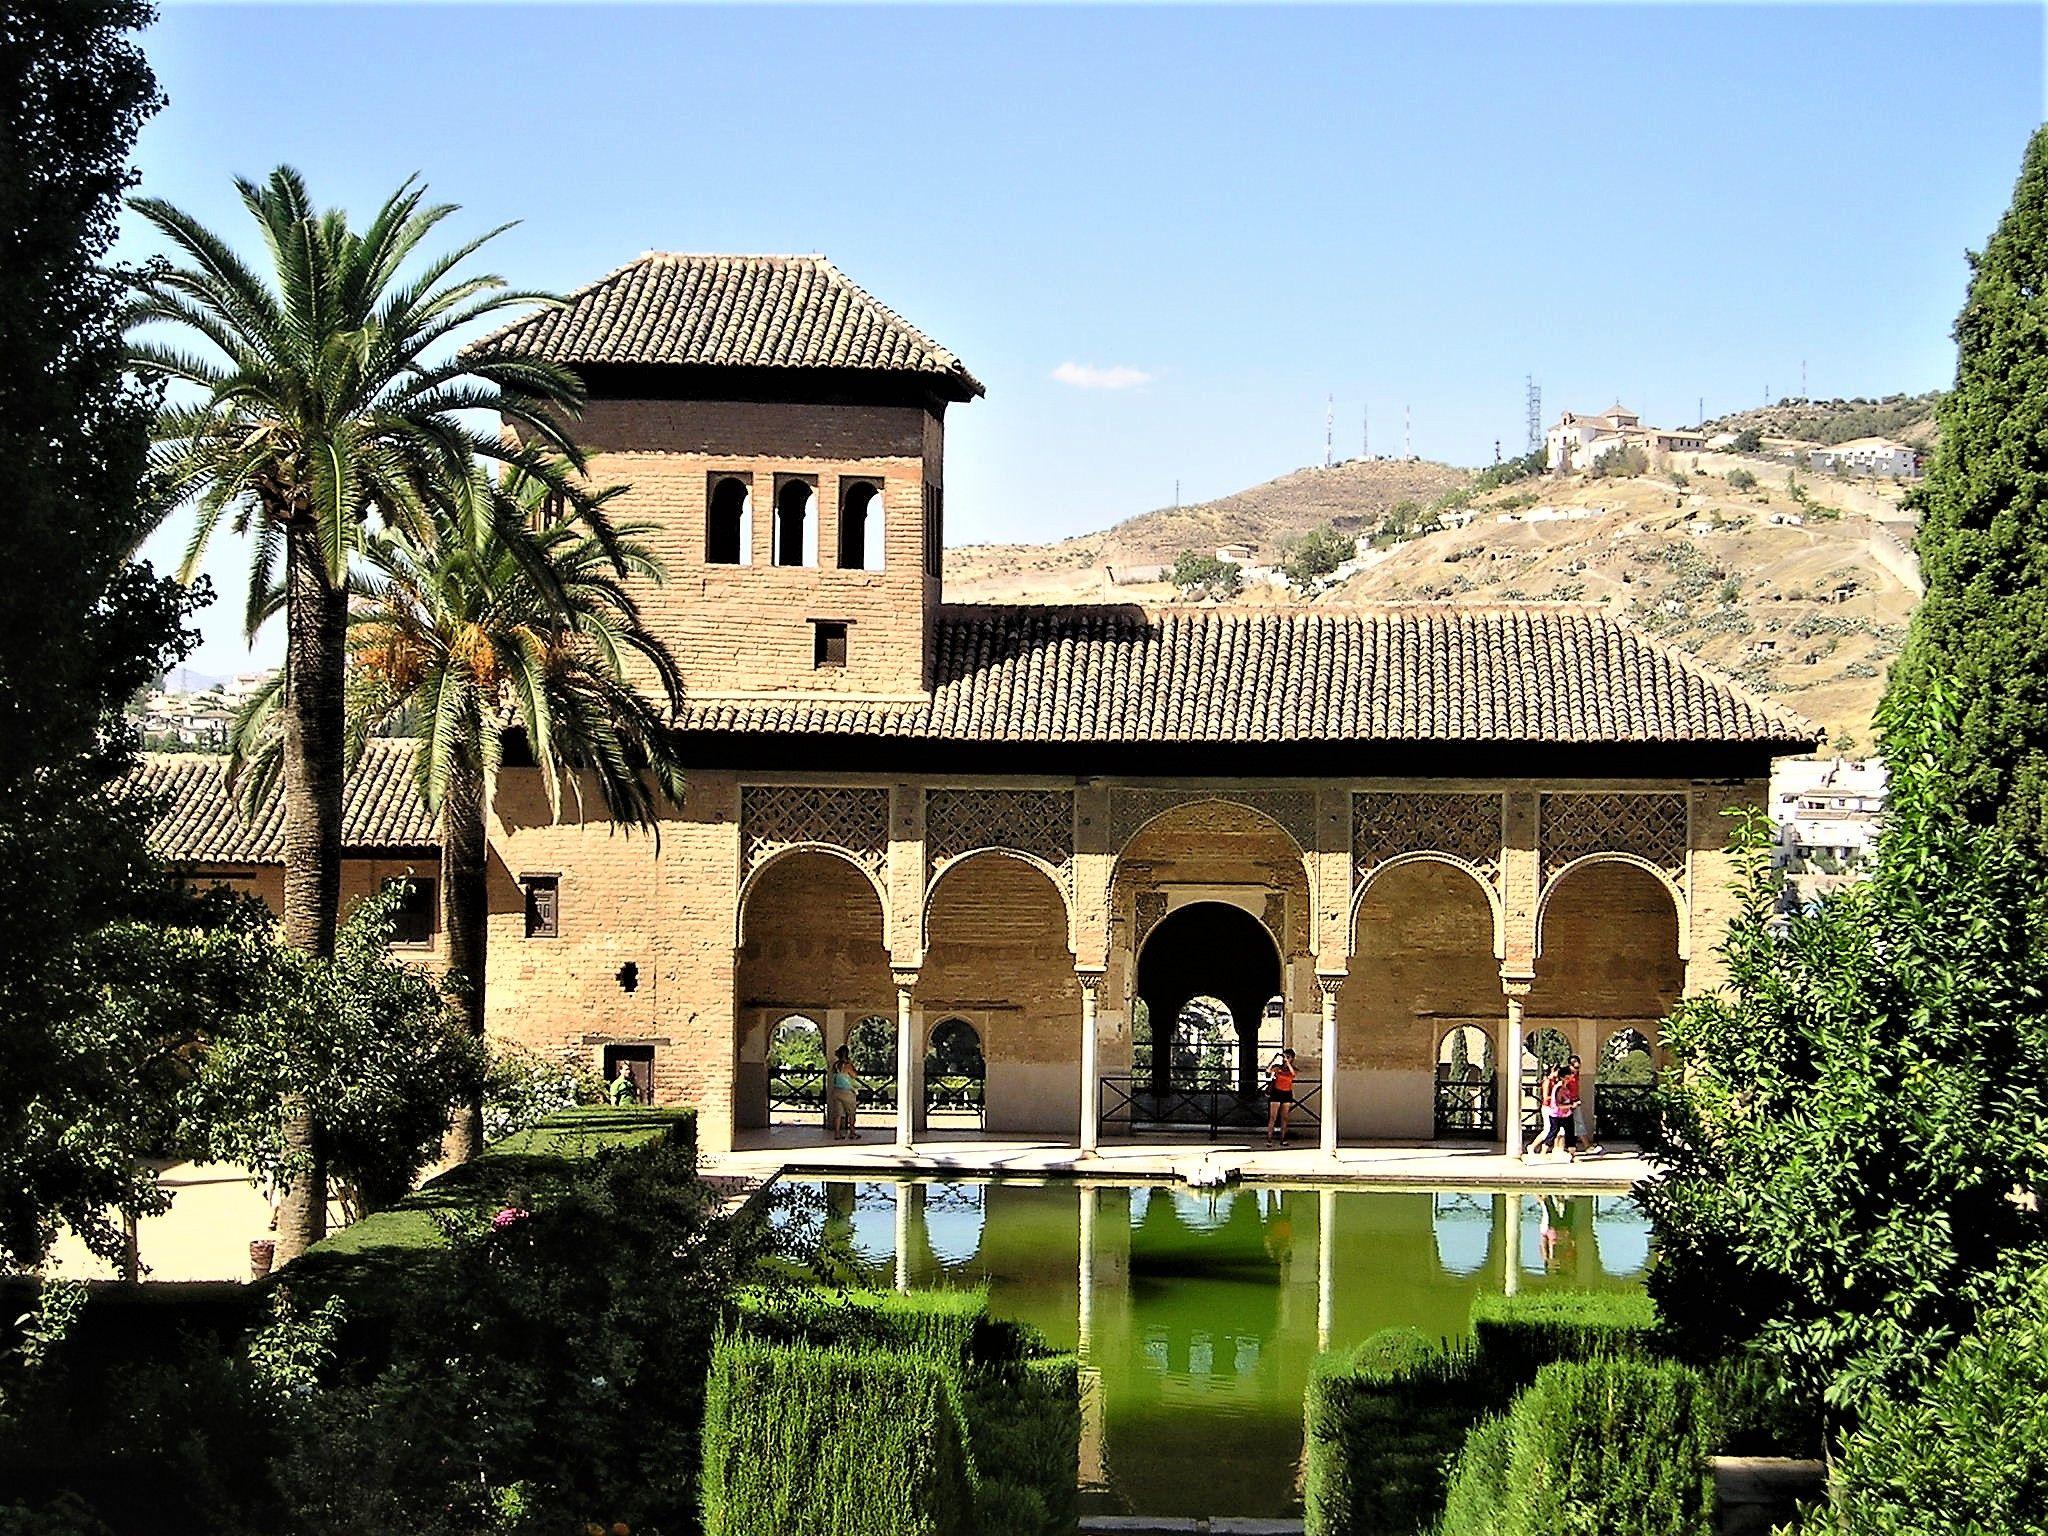 grenade jardin de lalhambra - Jardin De L Alhambra